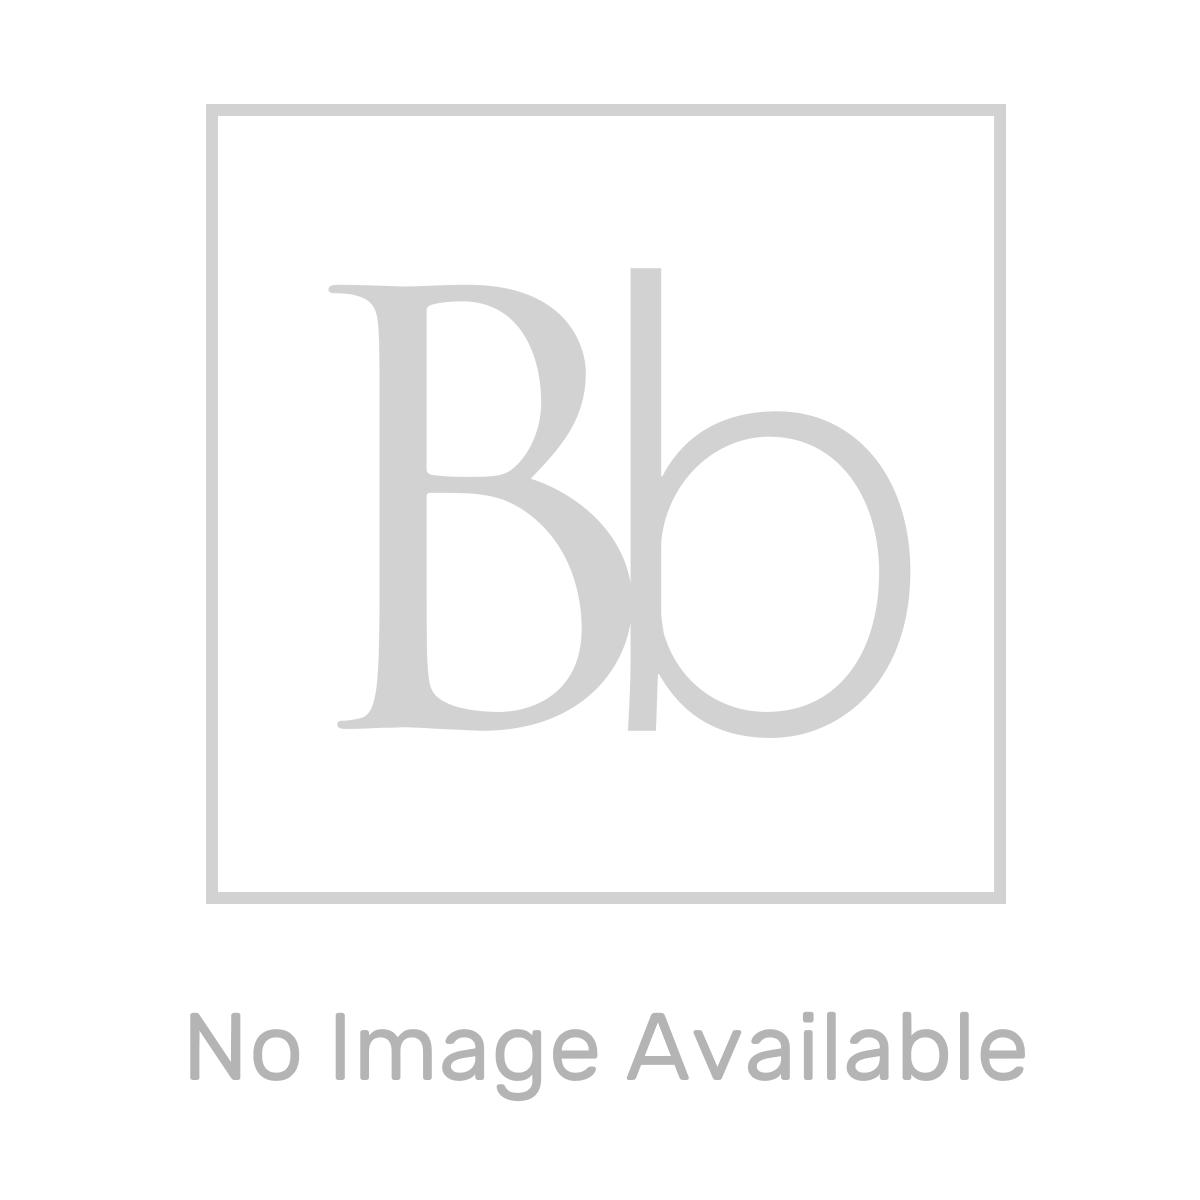 RAK Ecofix Regular Concealed Cistern 410 x 735mm